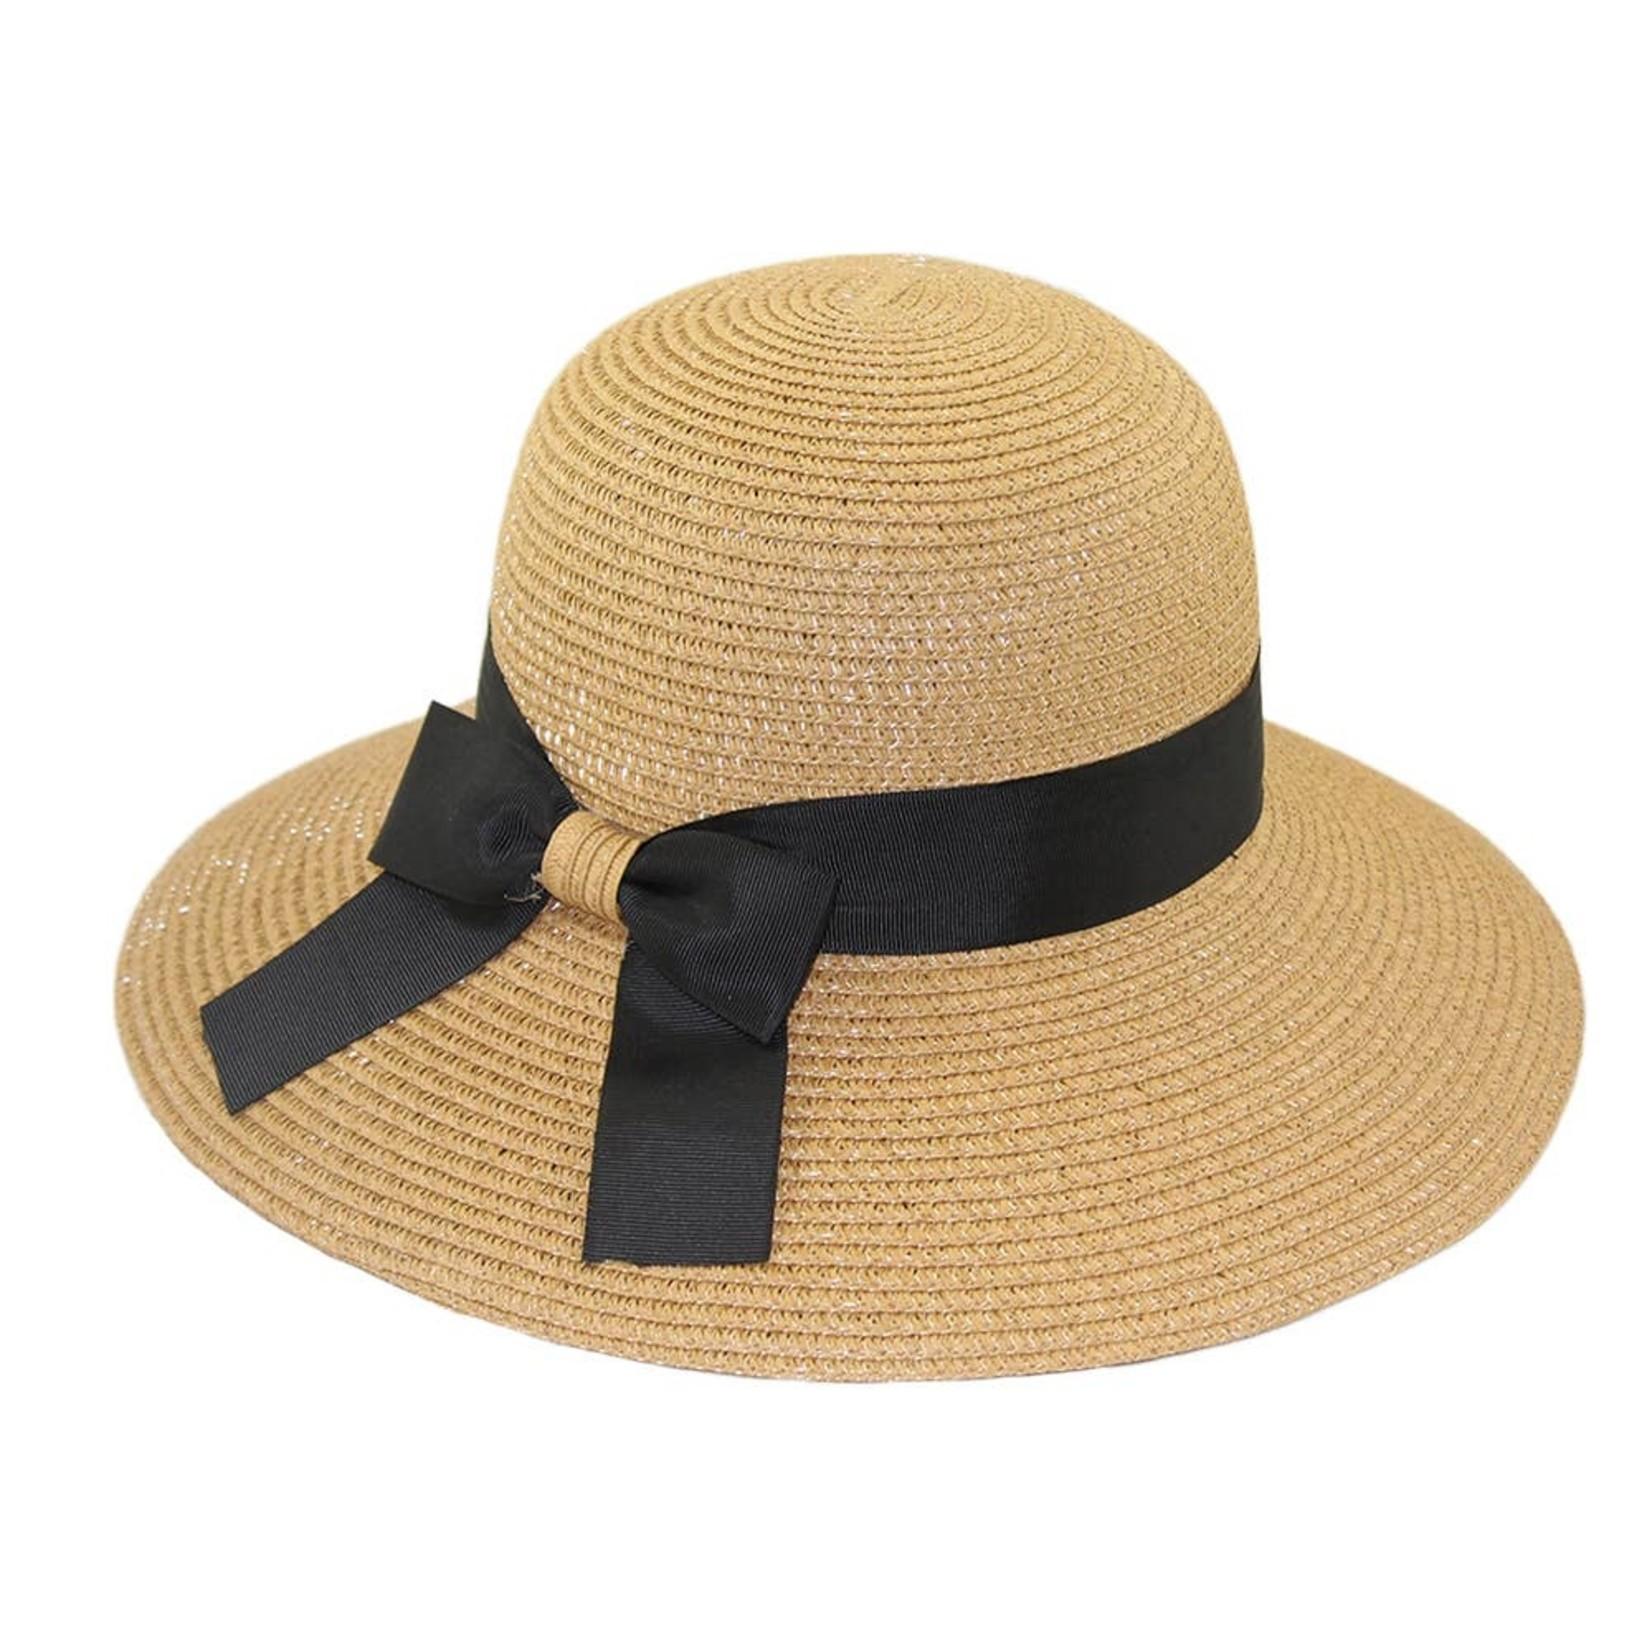 Hat Stack 73995 Bronze Bucket w/ Blk Ribbon